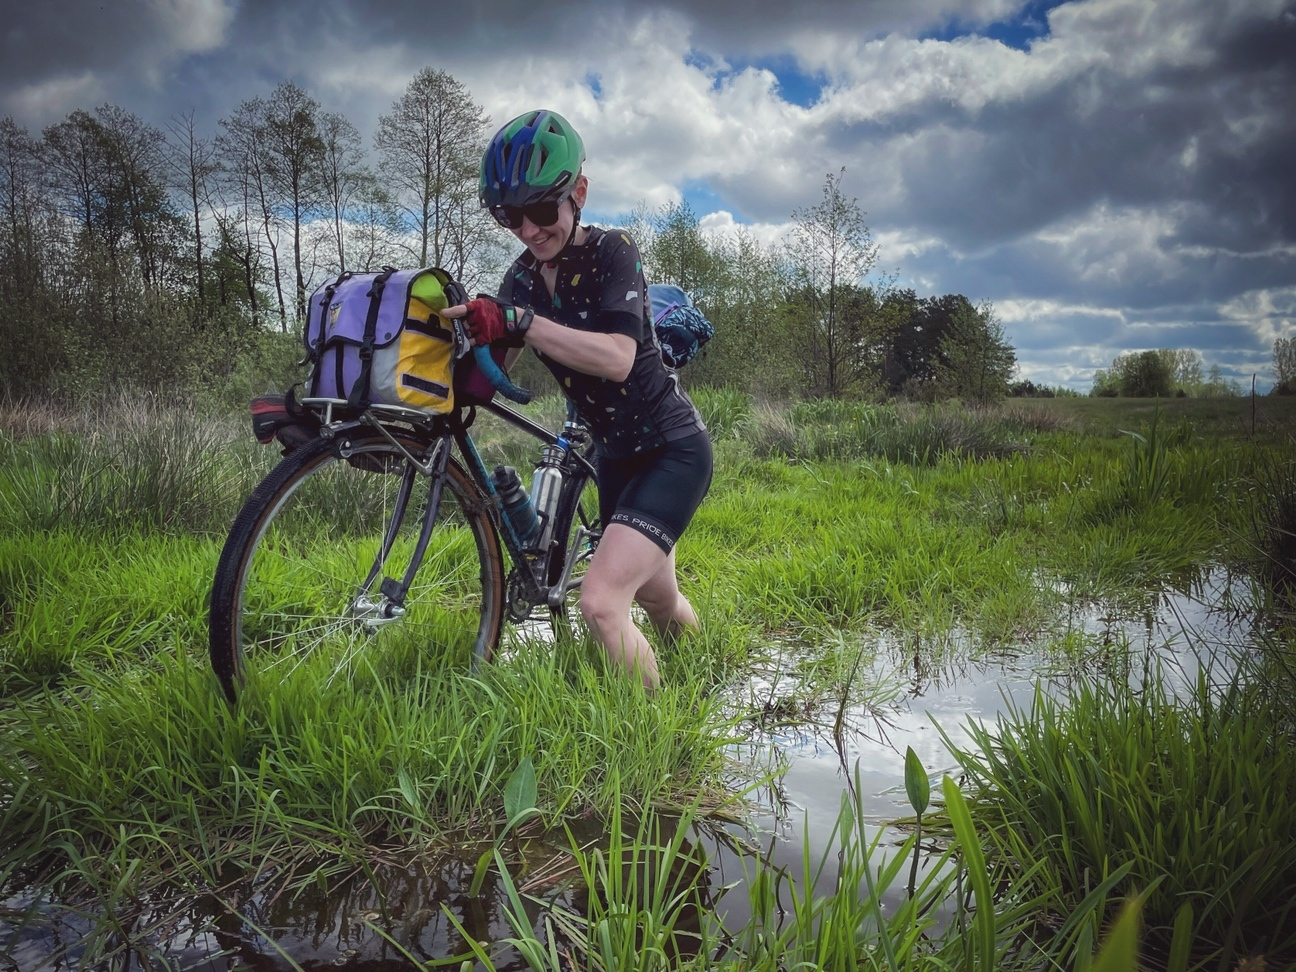 Hike a bike photo from Helen Semchenko Pushing through a river bog in Ukraine